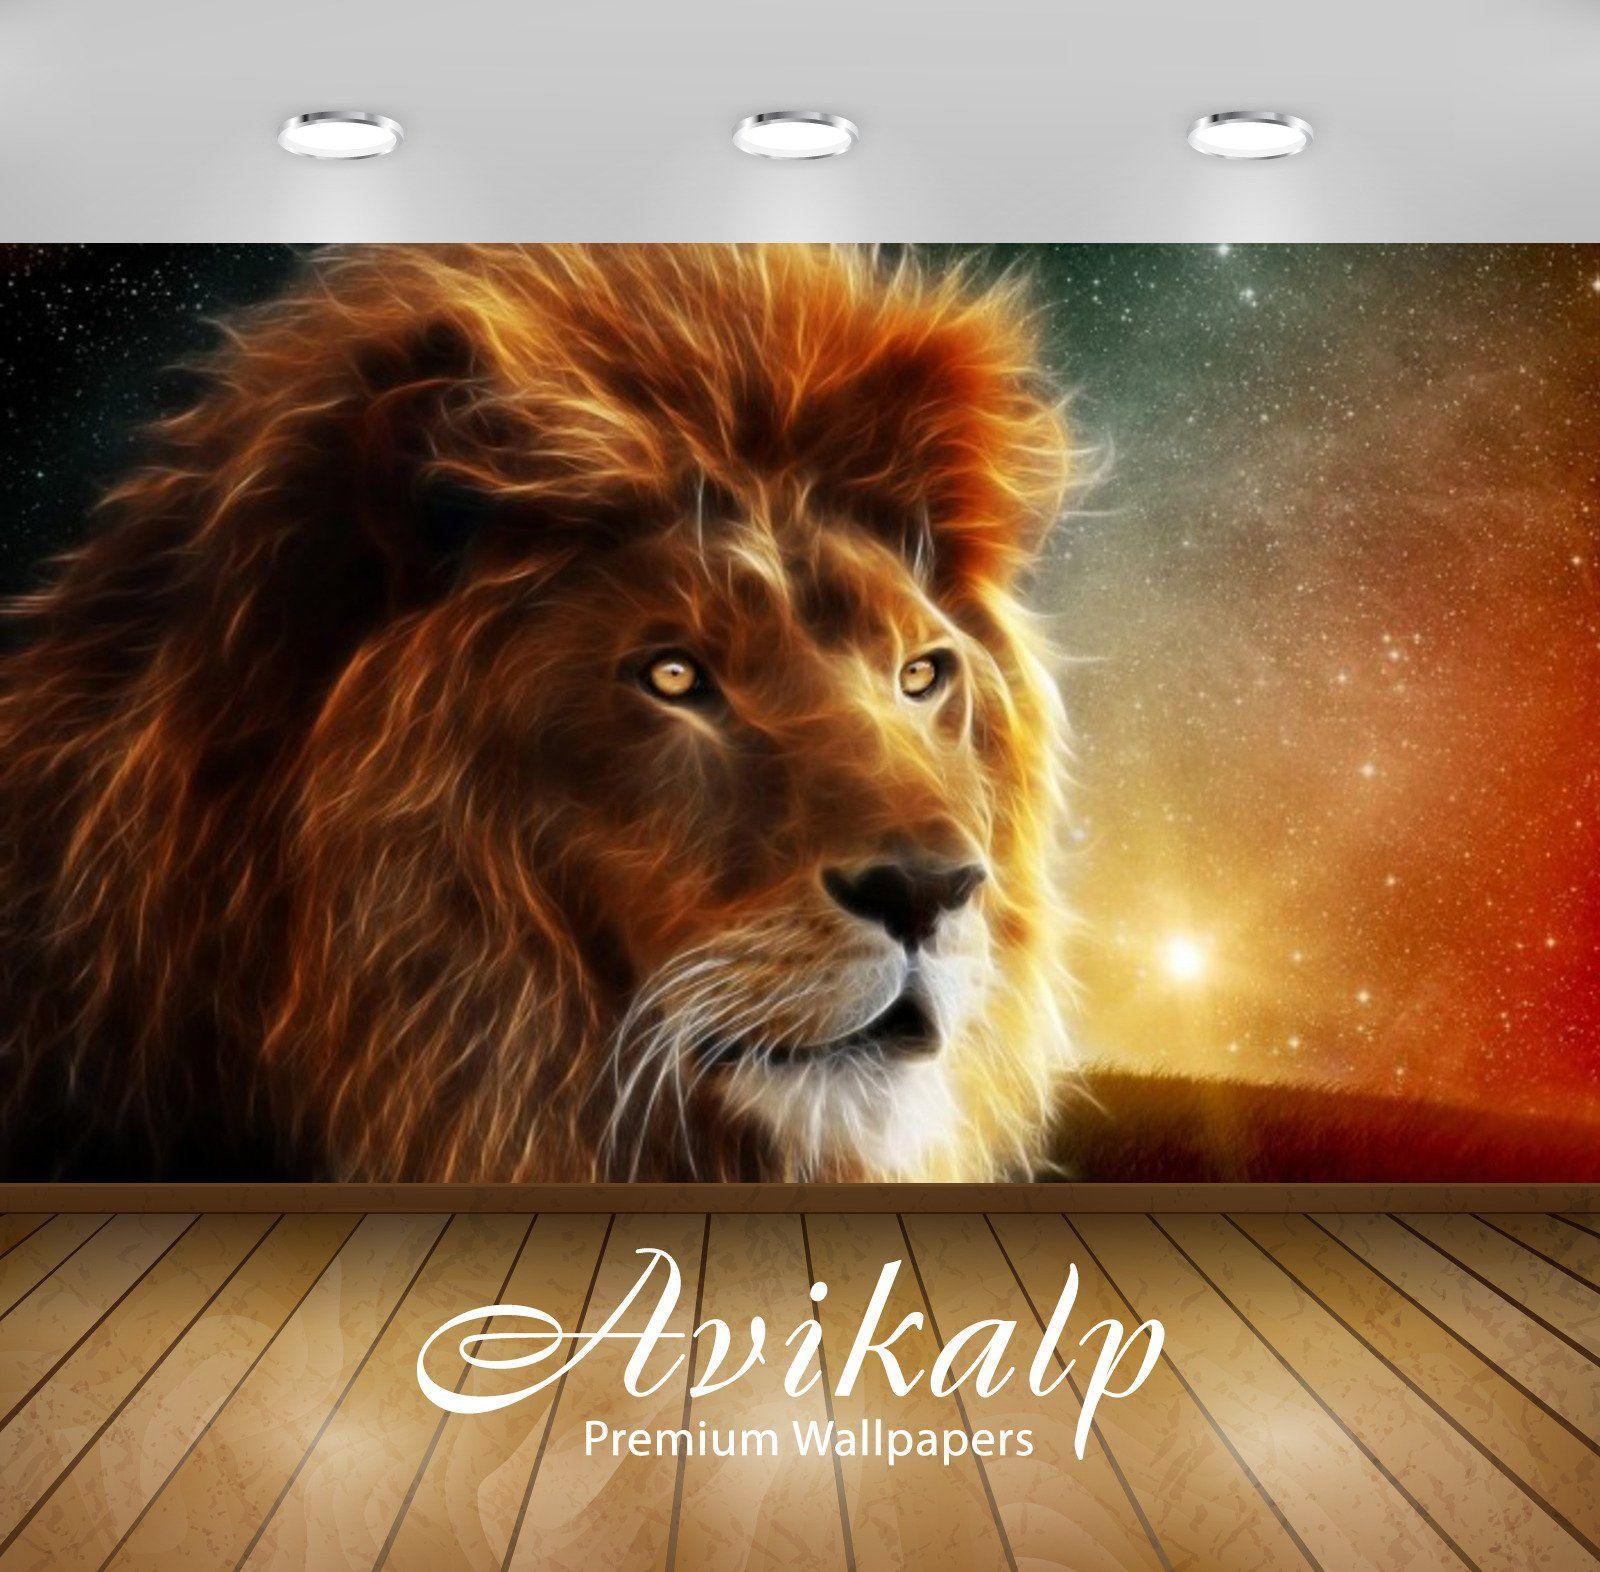 Avikalp Exclusive Awi2796 Lion Digital Art Animal Full Hd Wallpapers For Living Room Hall Kids Roo 3dwallpaperselfa Full Hd Wallpaper Wallpaper Hd Wallpaper